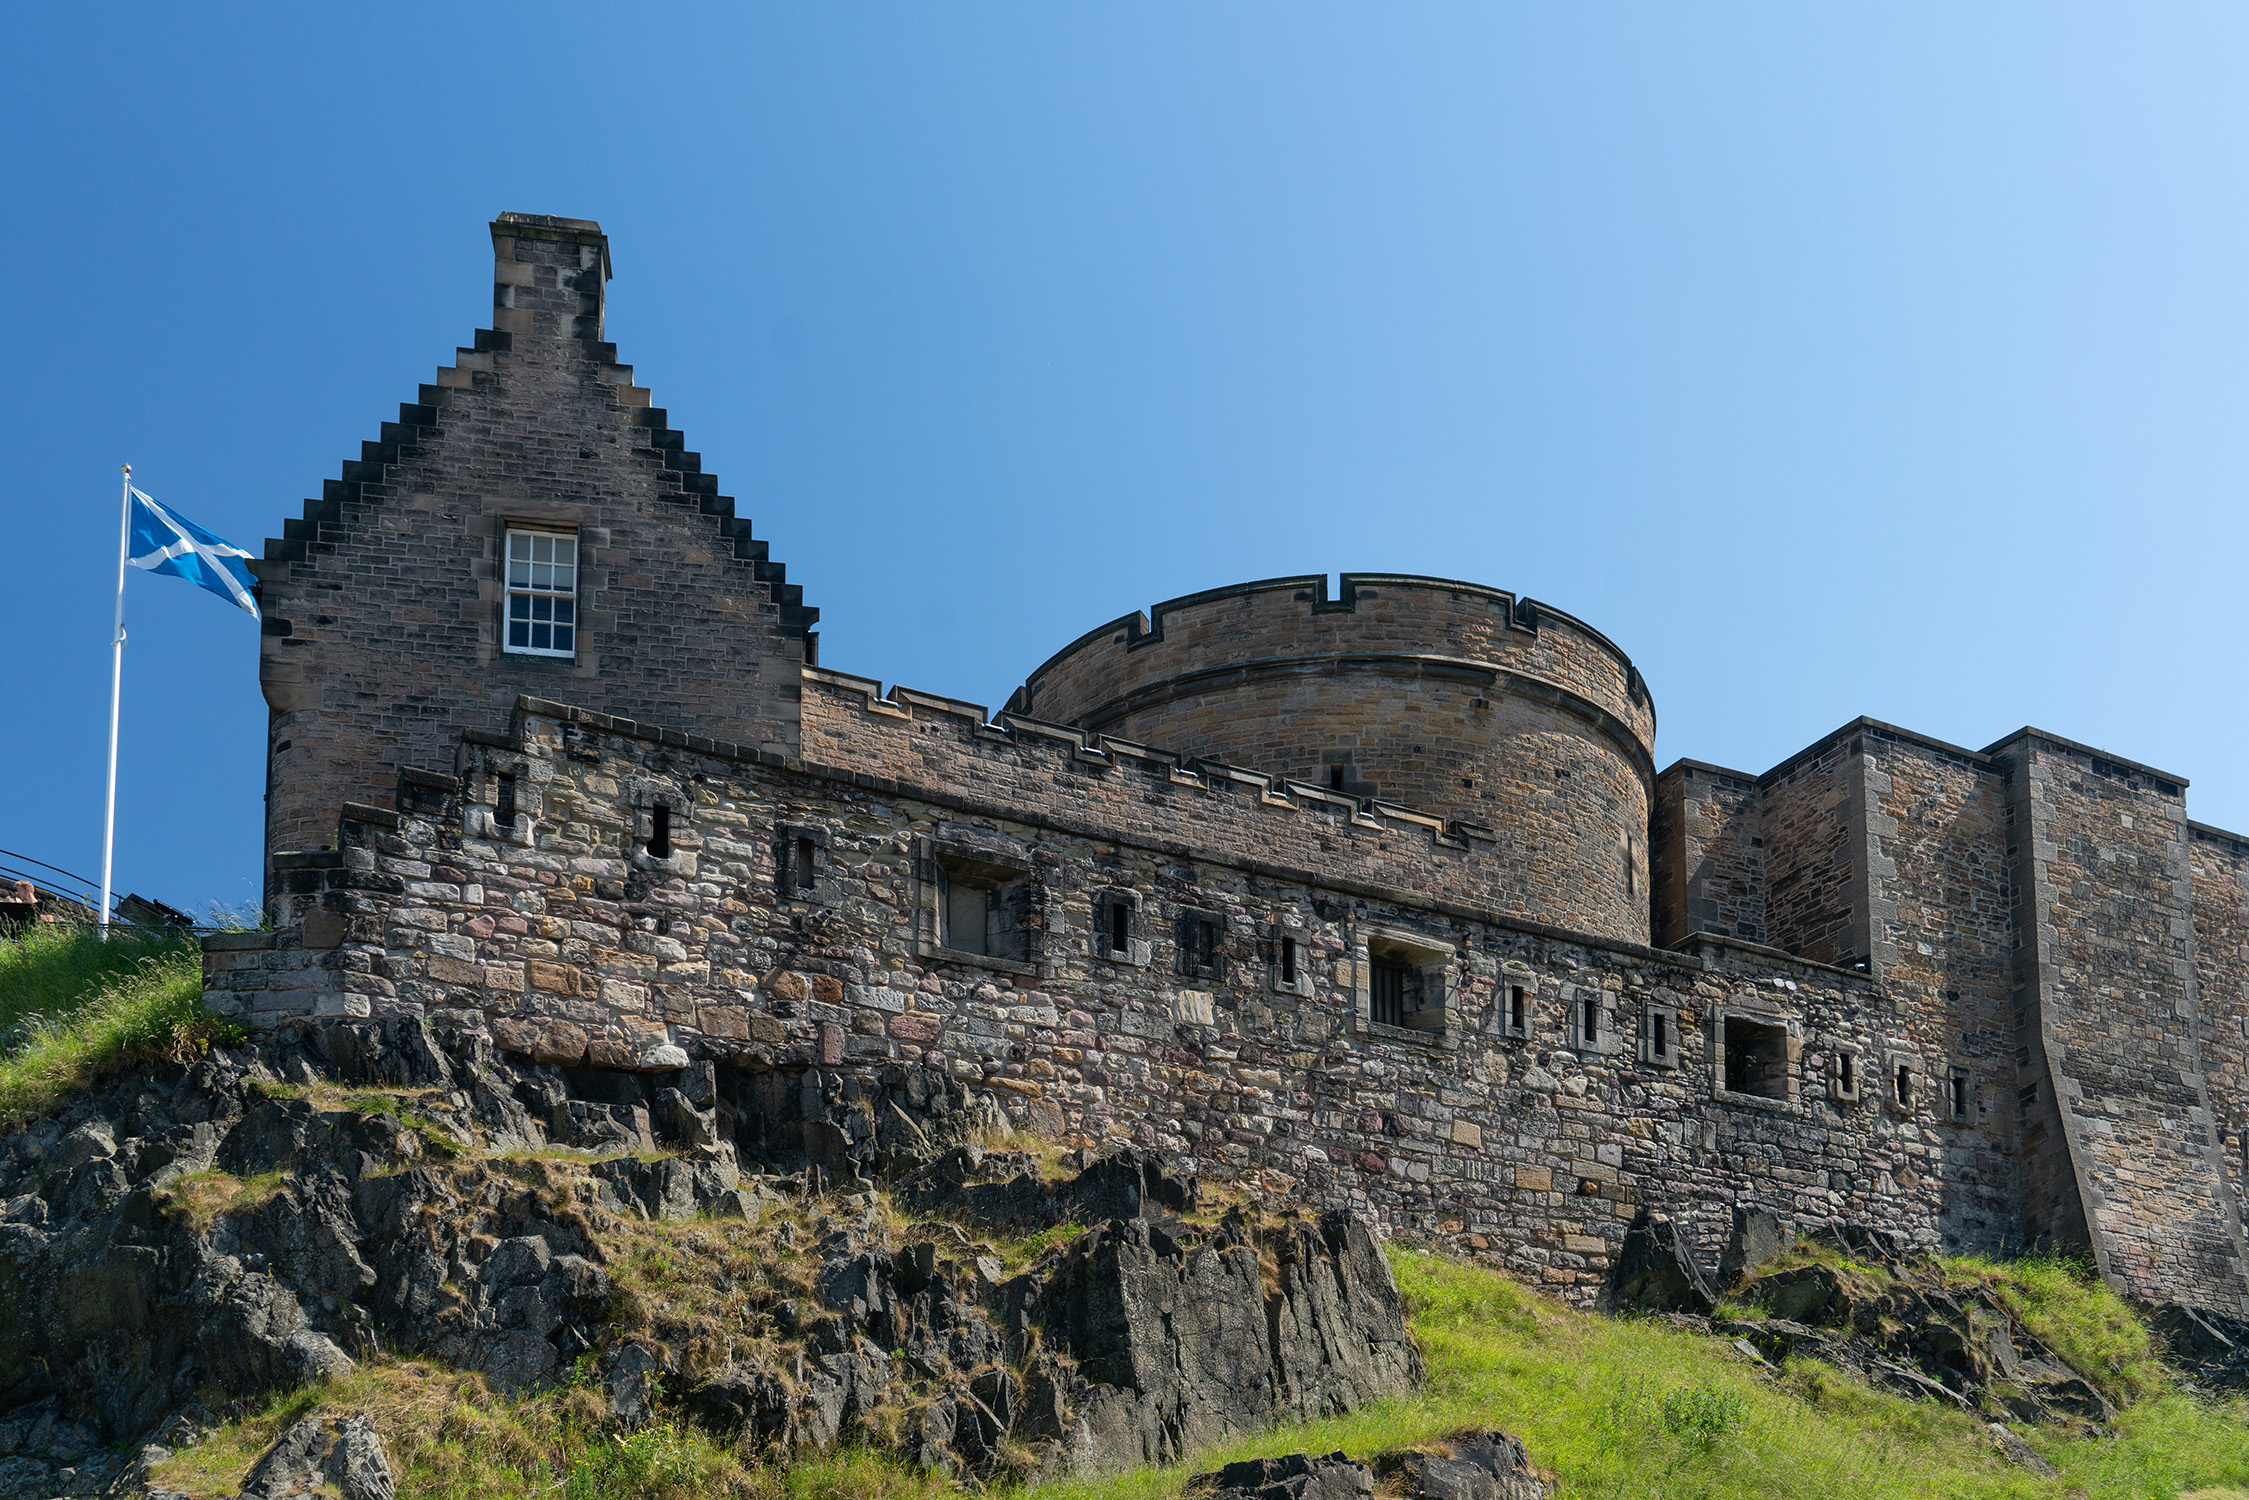 #flag, #castle, #edinburgh, #tickets, #history, #tour, #travel